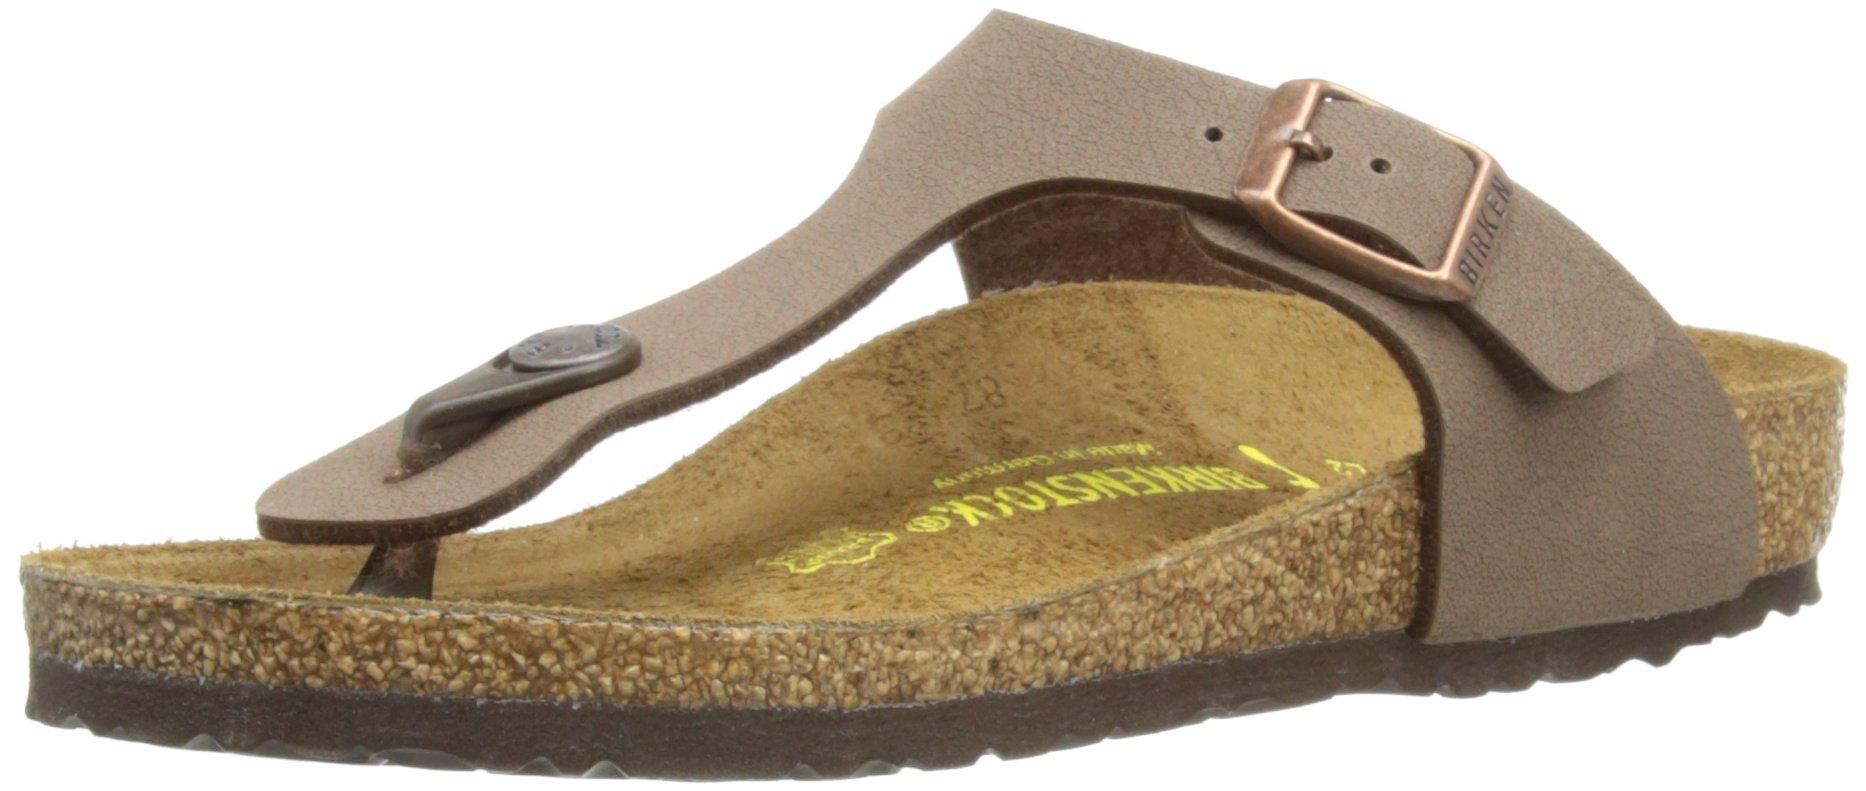 Birkenstock Unisex-Child Gizeh Kids Mocca Birkibuc Sandals 31.0 N EU N 846133